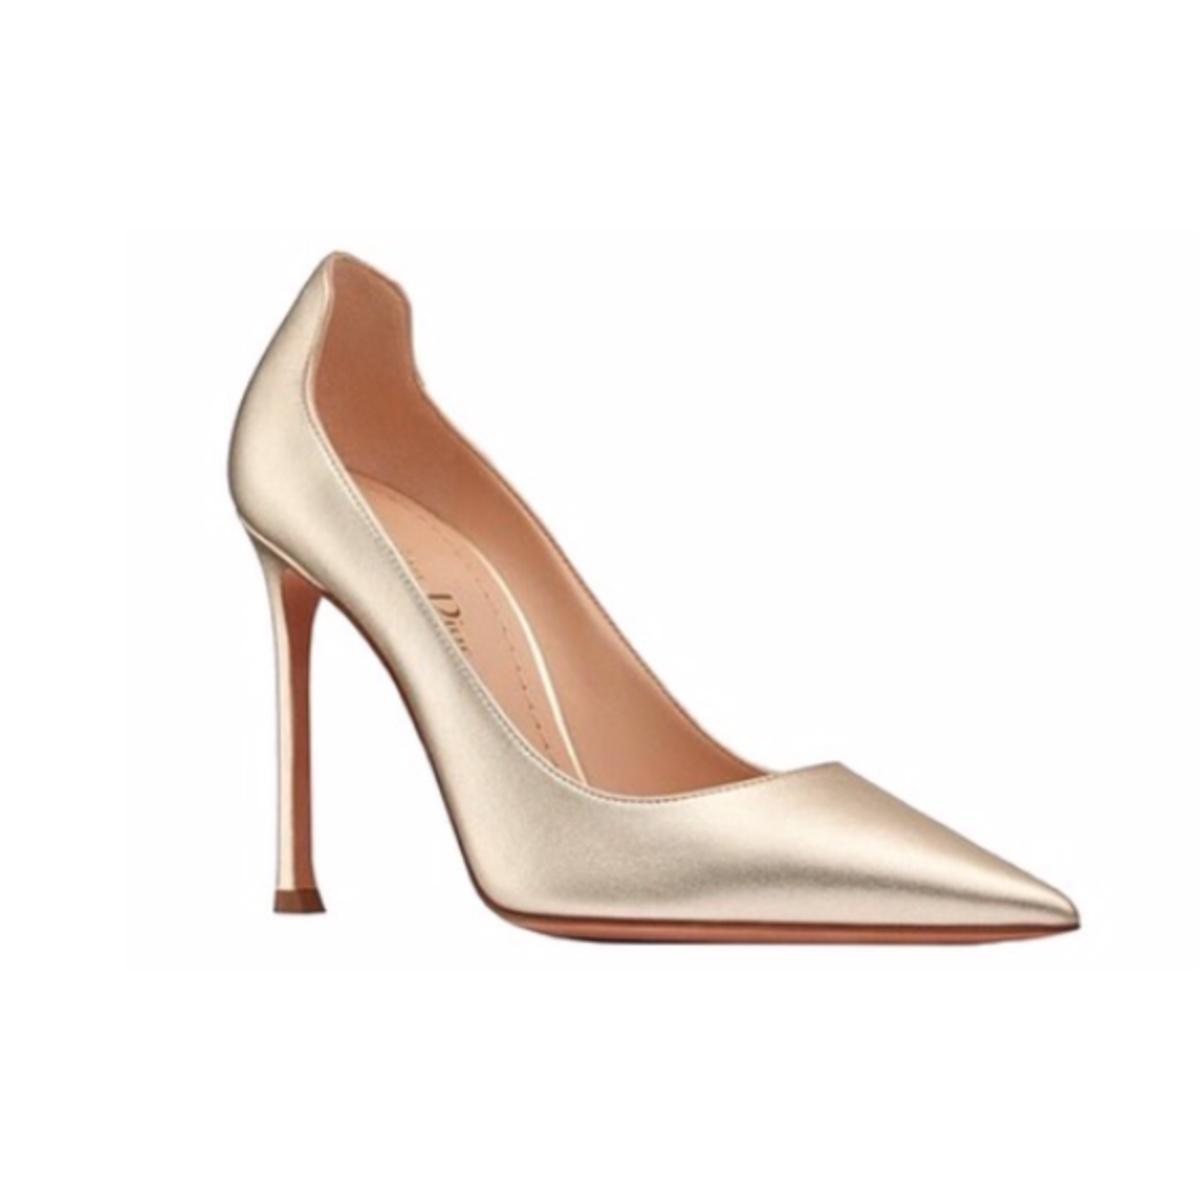 Meghan-Markle-Gold-Heels-2.jpg